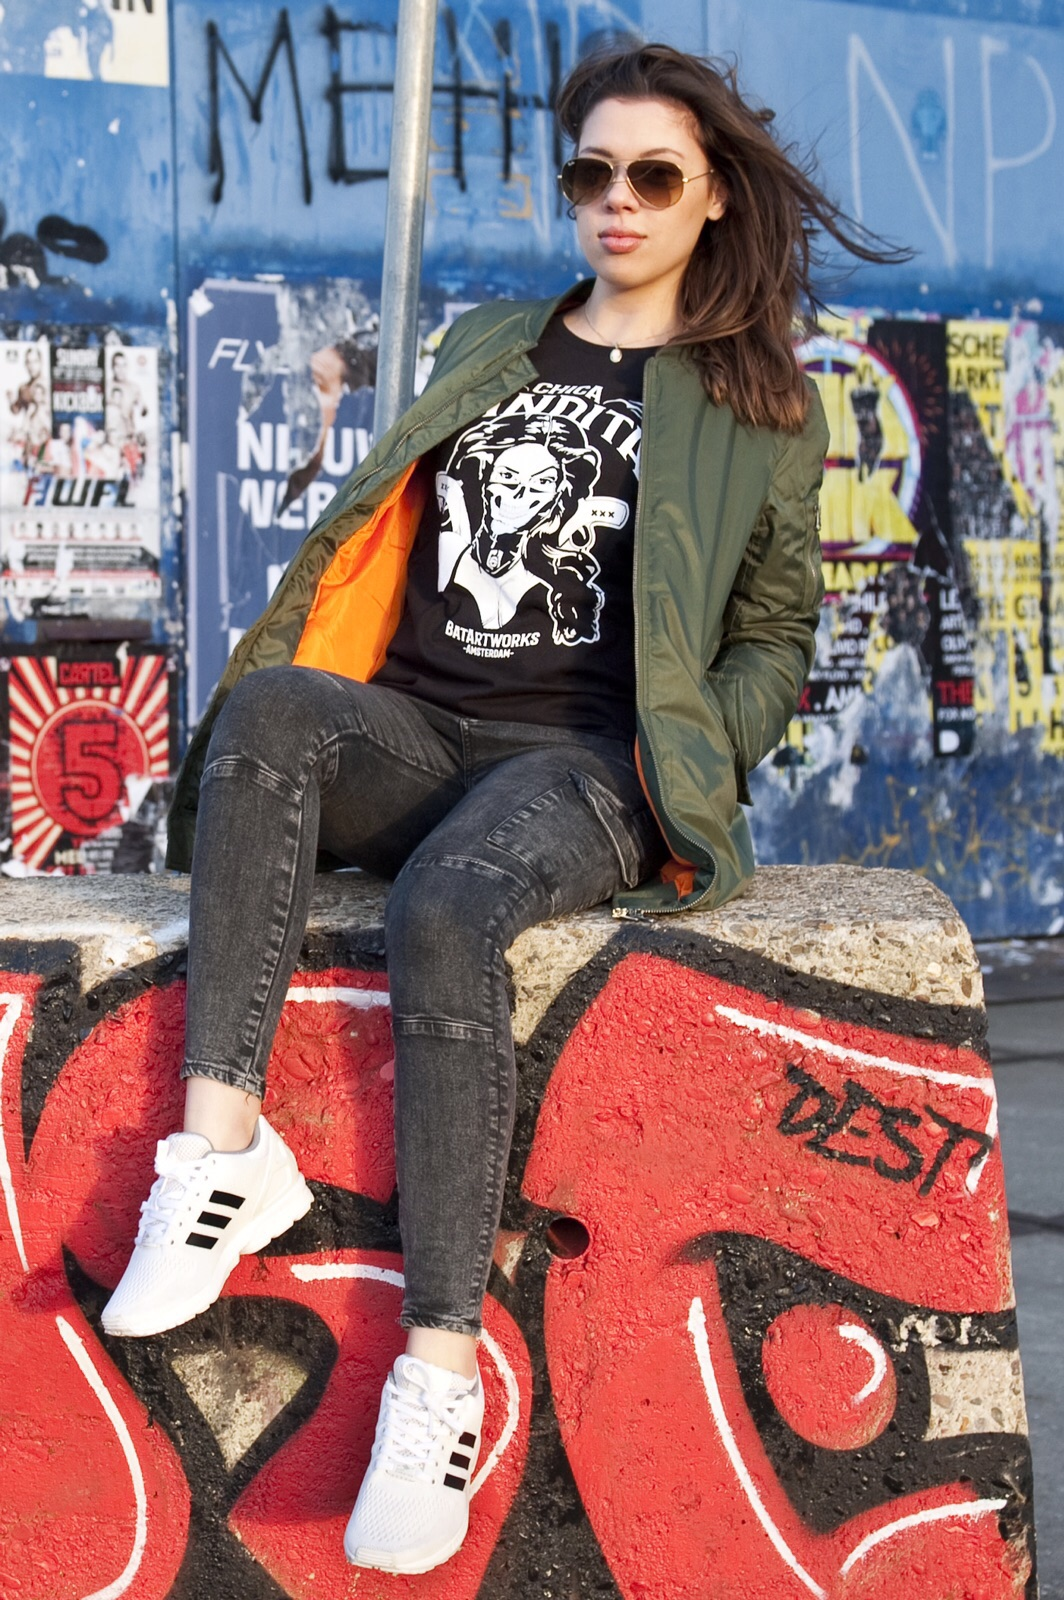 Street wear Chica Bandita shirt Amsterdam